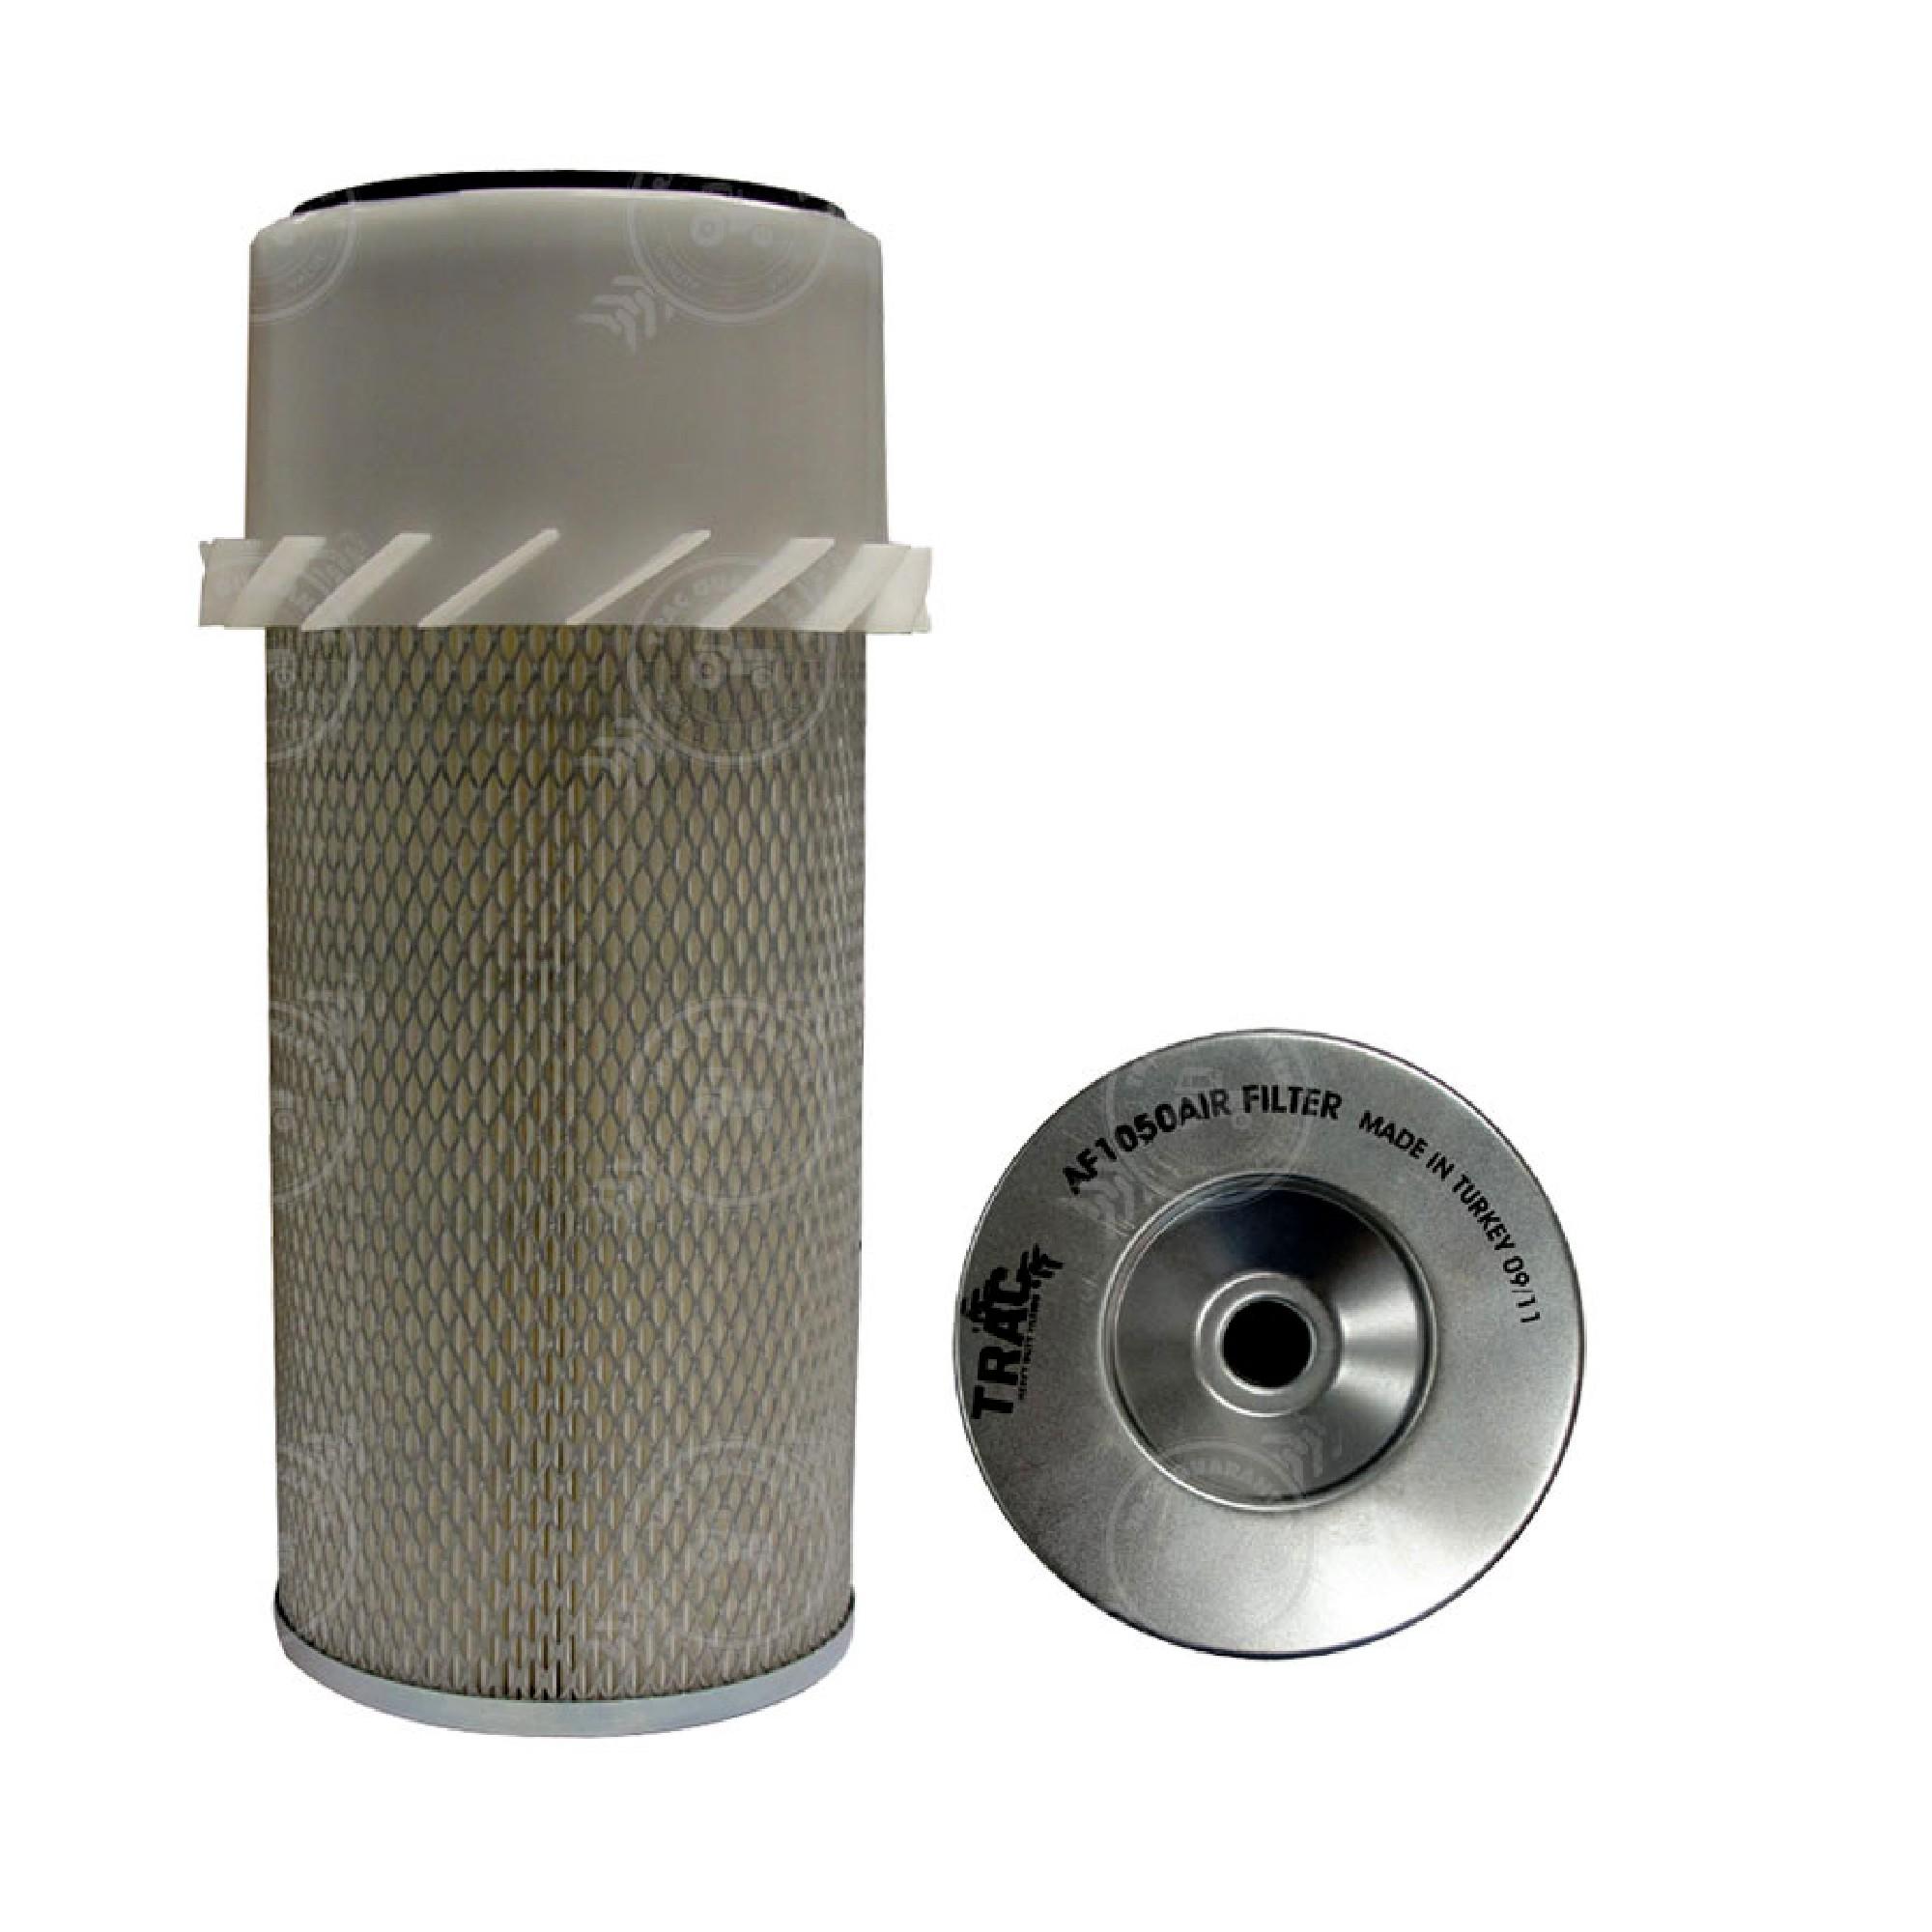 Allis Chalmers Air Cleaner : Air filter for allis chalmers case international harvester